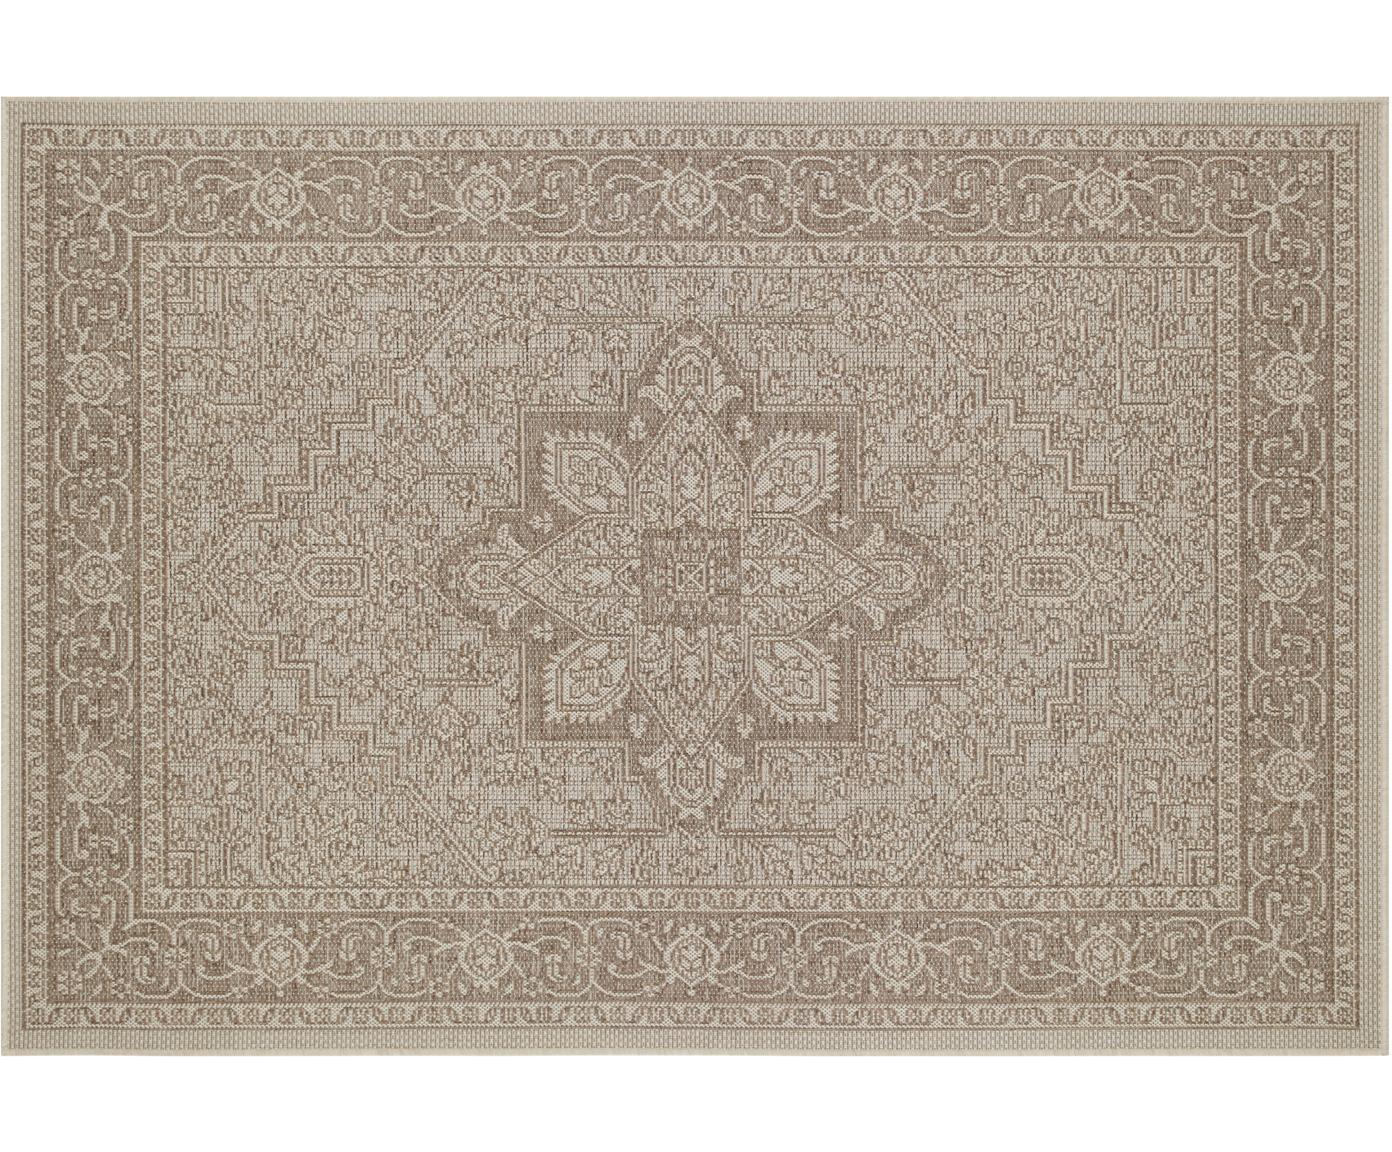 In- & outdoor vloerkleed Anjara in vintage look, Polypropyleen, Taupe, beige, B 140 x L 200 cm (maat S)